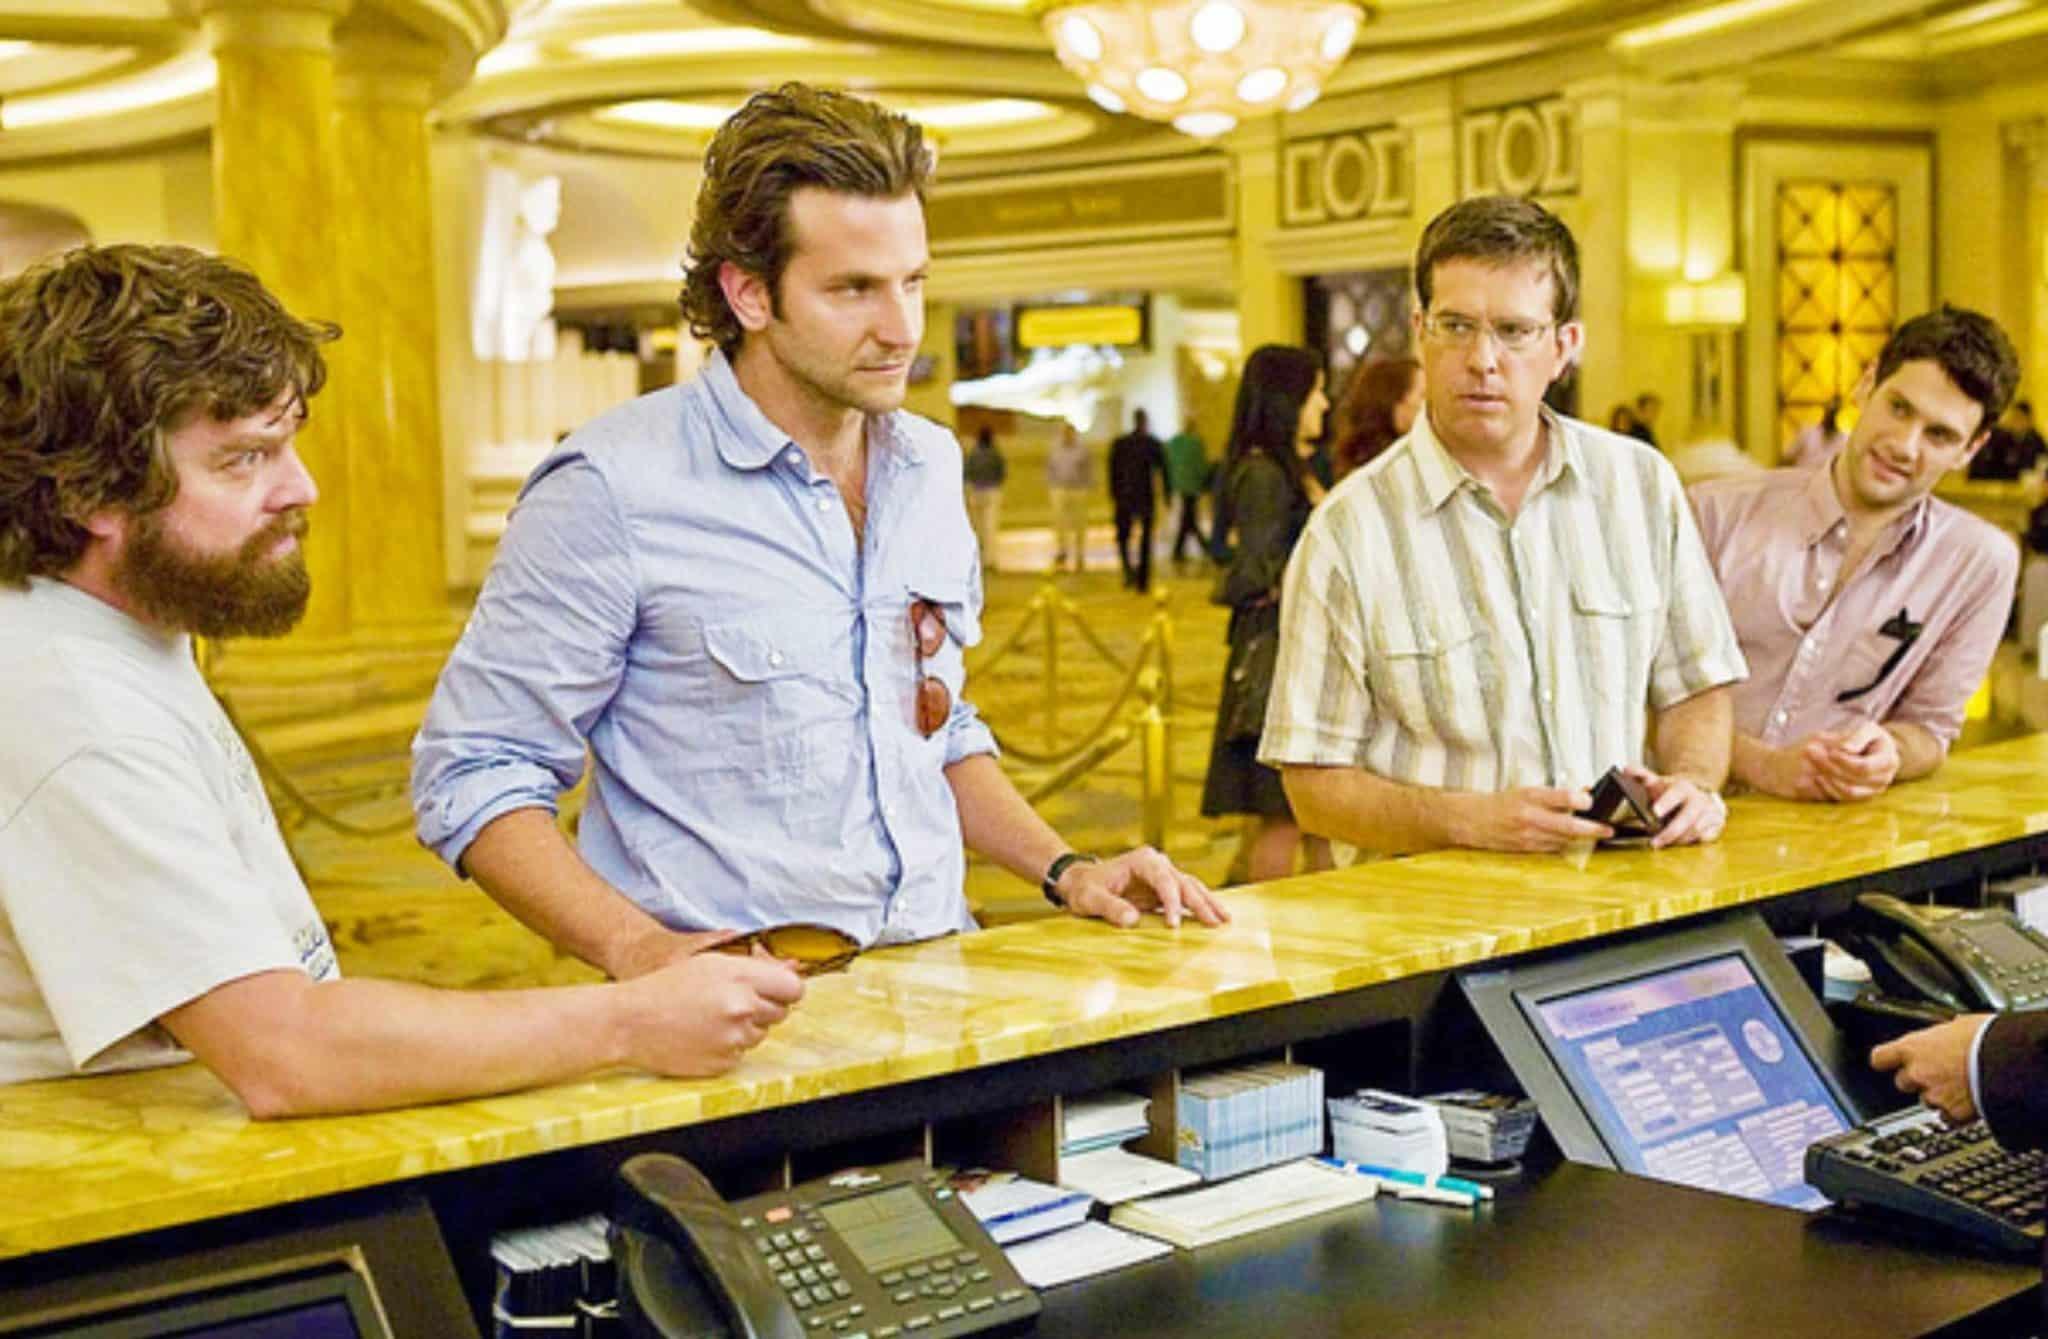 Caesars Palace Resacón en las Vegas